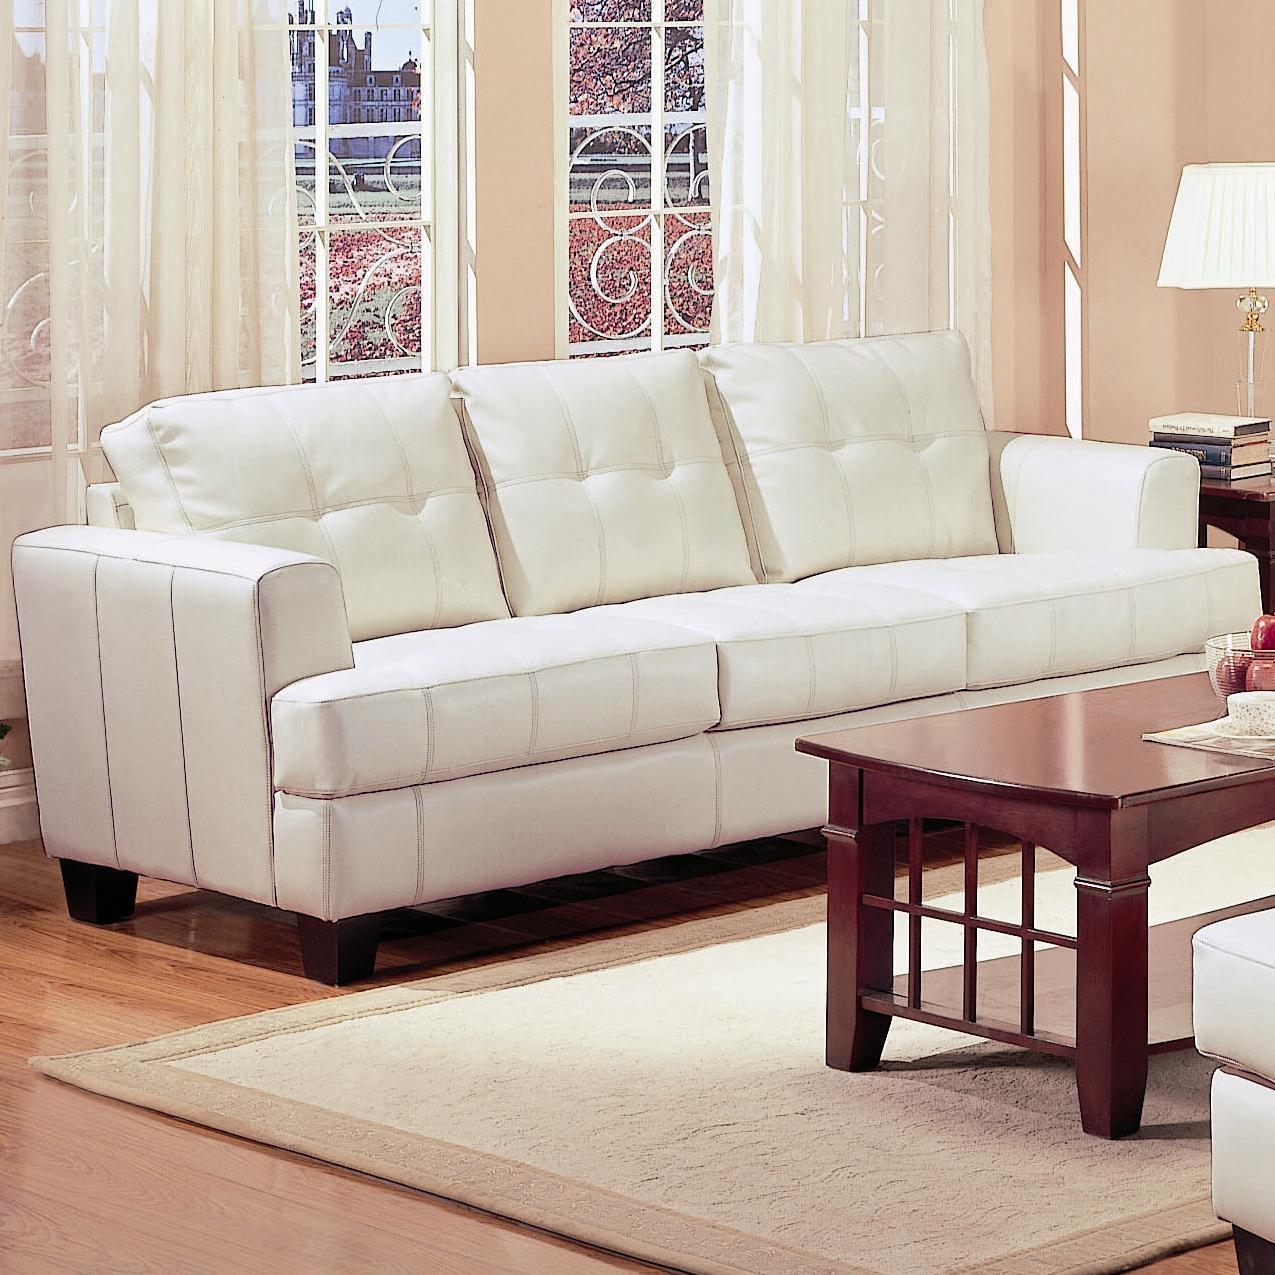 Sofas | Austin's Furniture Depot Pertaining To Austin Sleeper Sofas (Image 7 of 20)